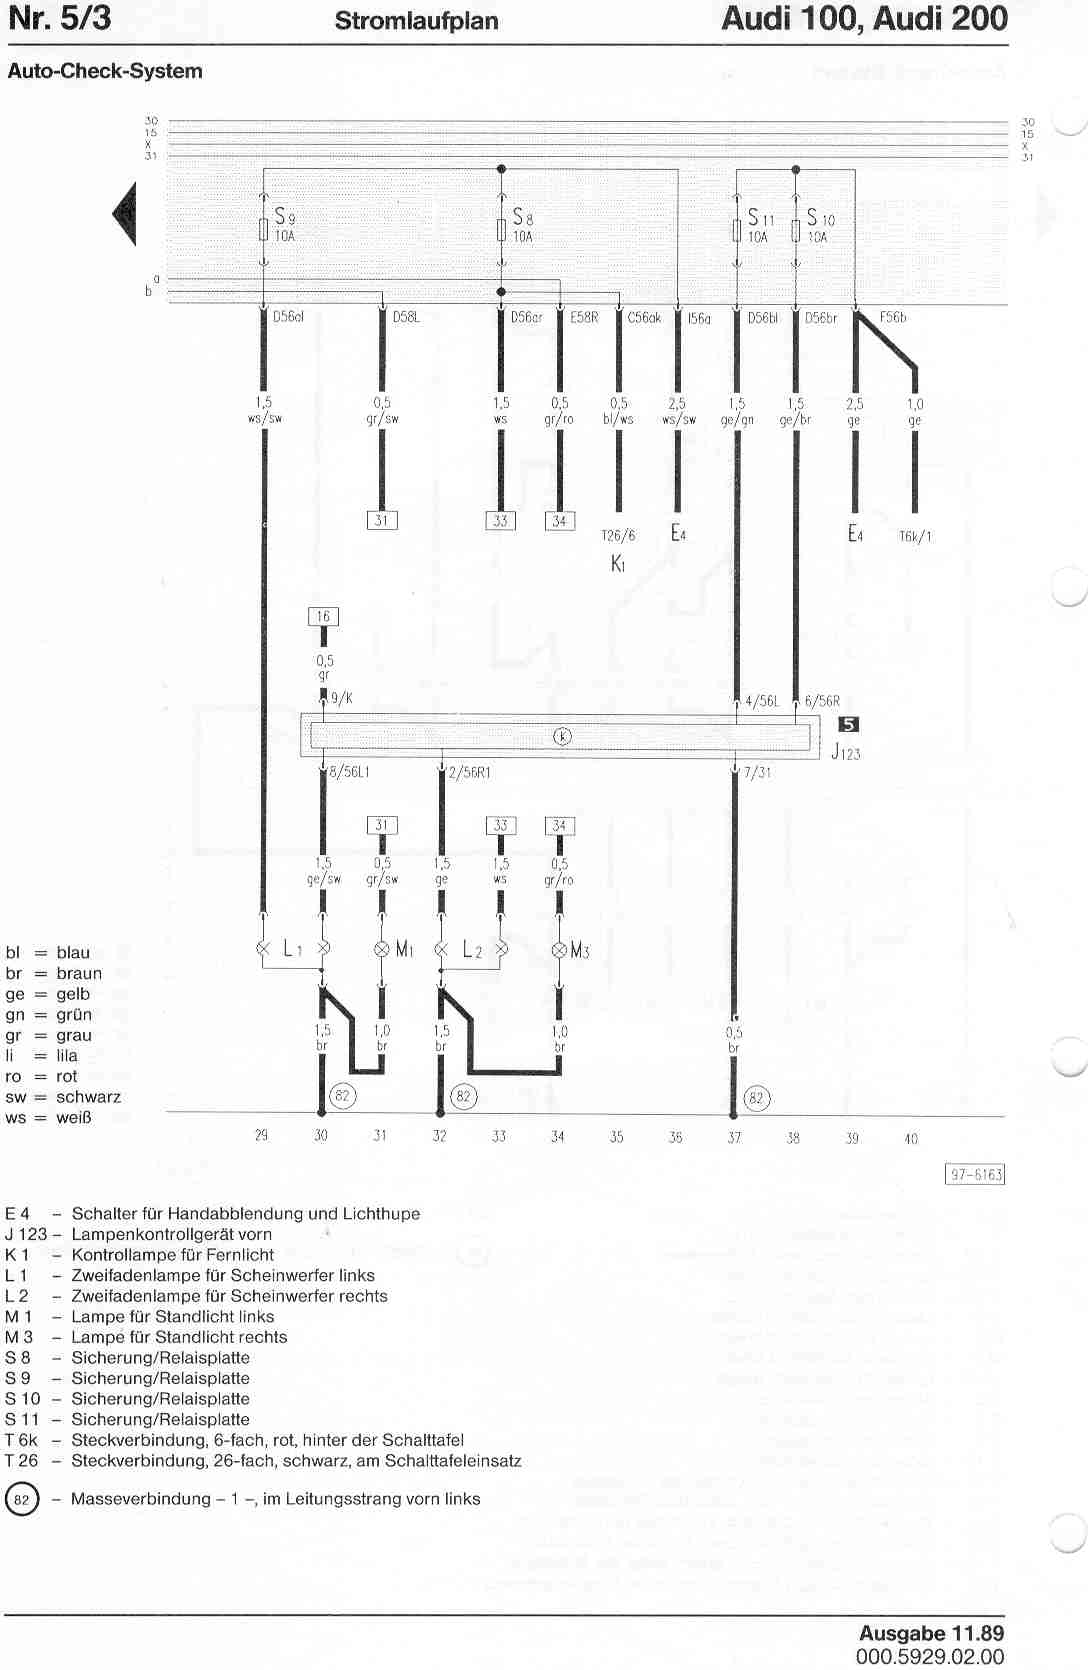 Audi 200 Wiring Diagram Schematics Diagrams 1998 A4 100 Factory Rh Sizov Org 98 Fuse